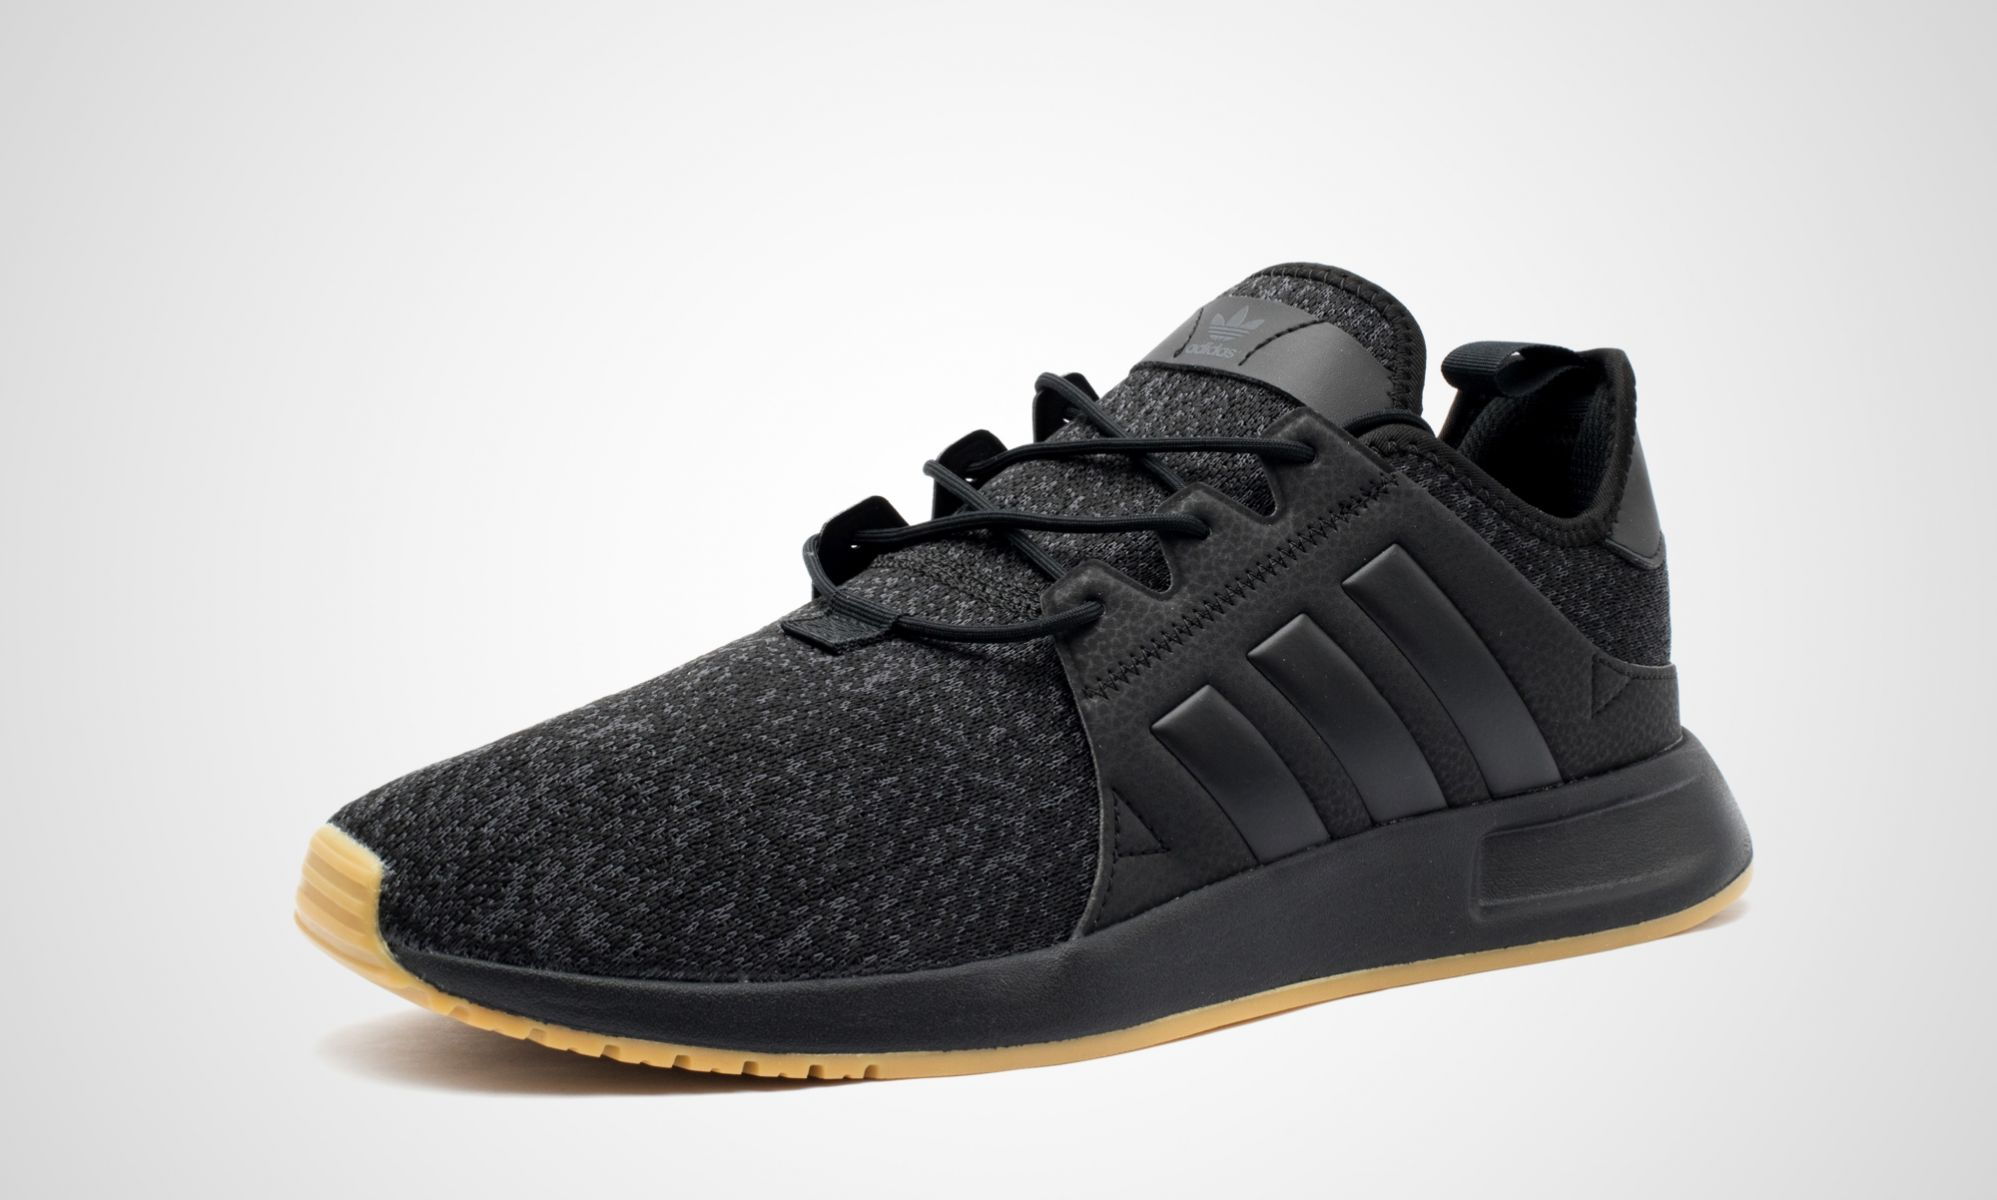 plr Adidas Trefoil X Originals Sportive Nero 2018 Uomo Sneakers Trainers Scarpe UUxBr8w1q